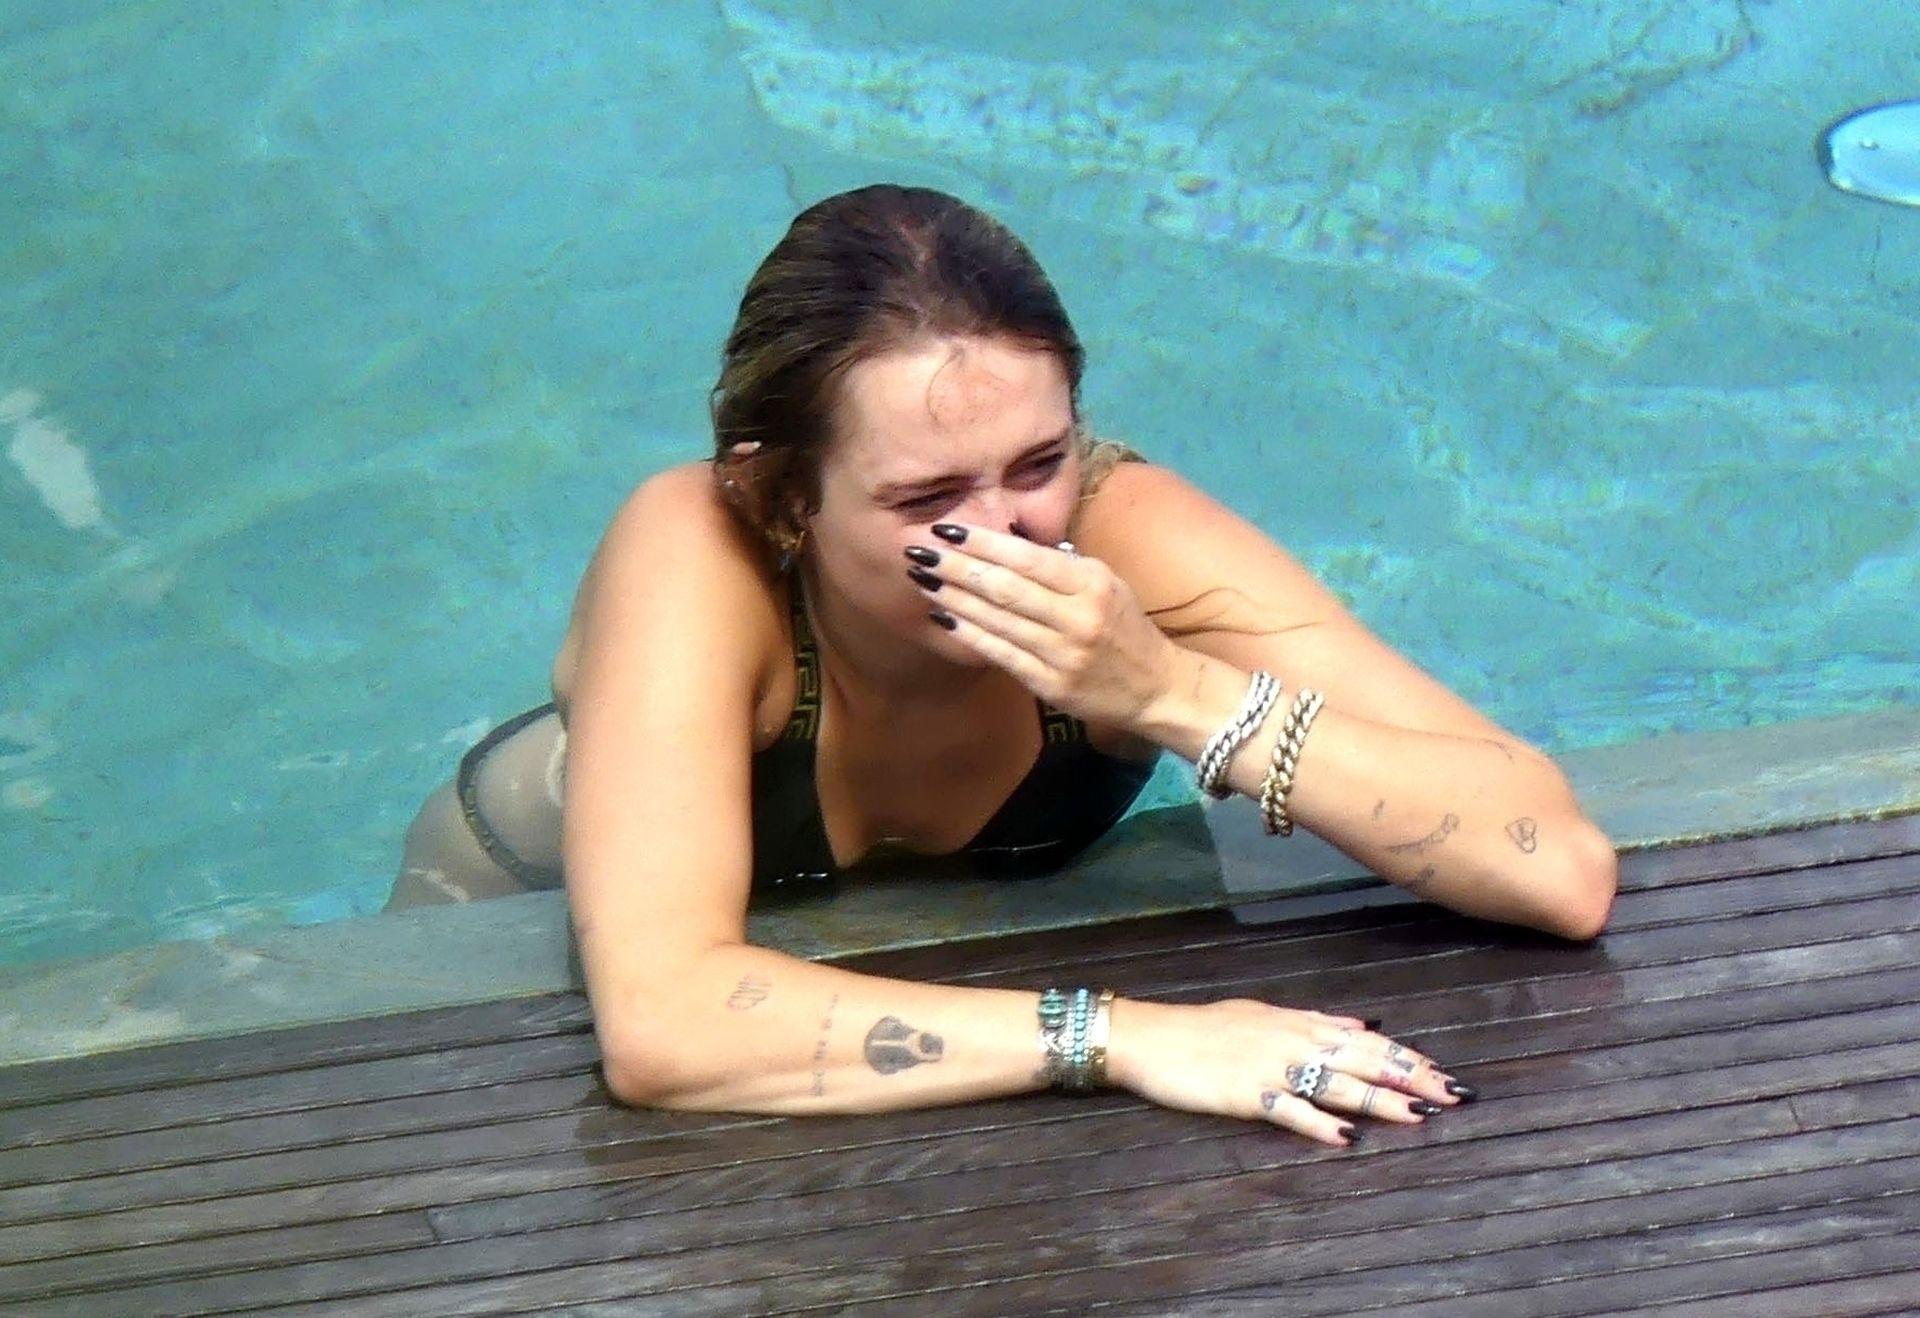 0713004446900_15_Miley-Cyrus-Topless-Kaitlynn-Carter-Hot-TheFappeningBlog.com-15.jpg